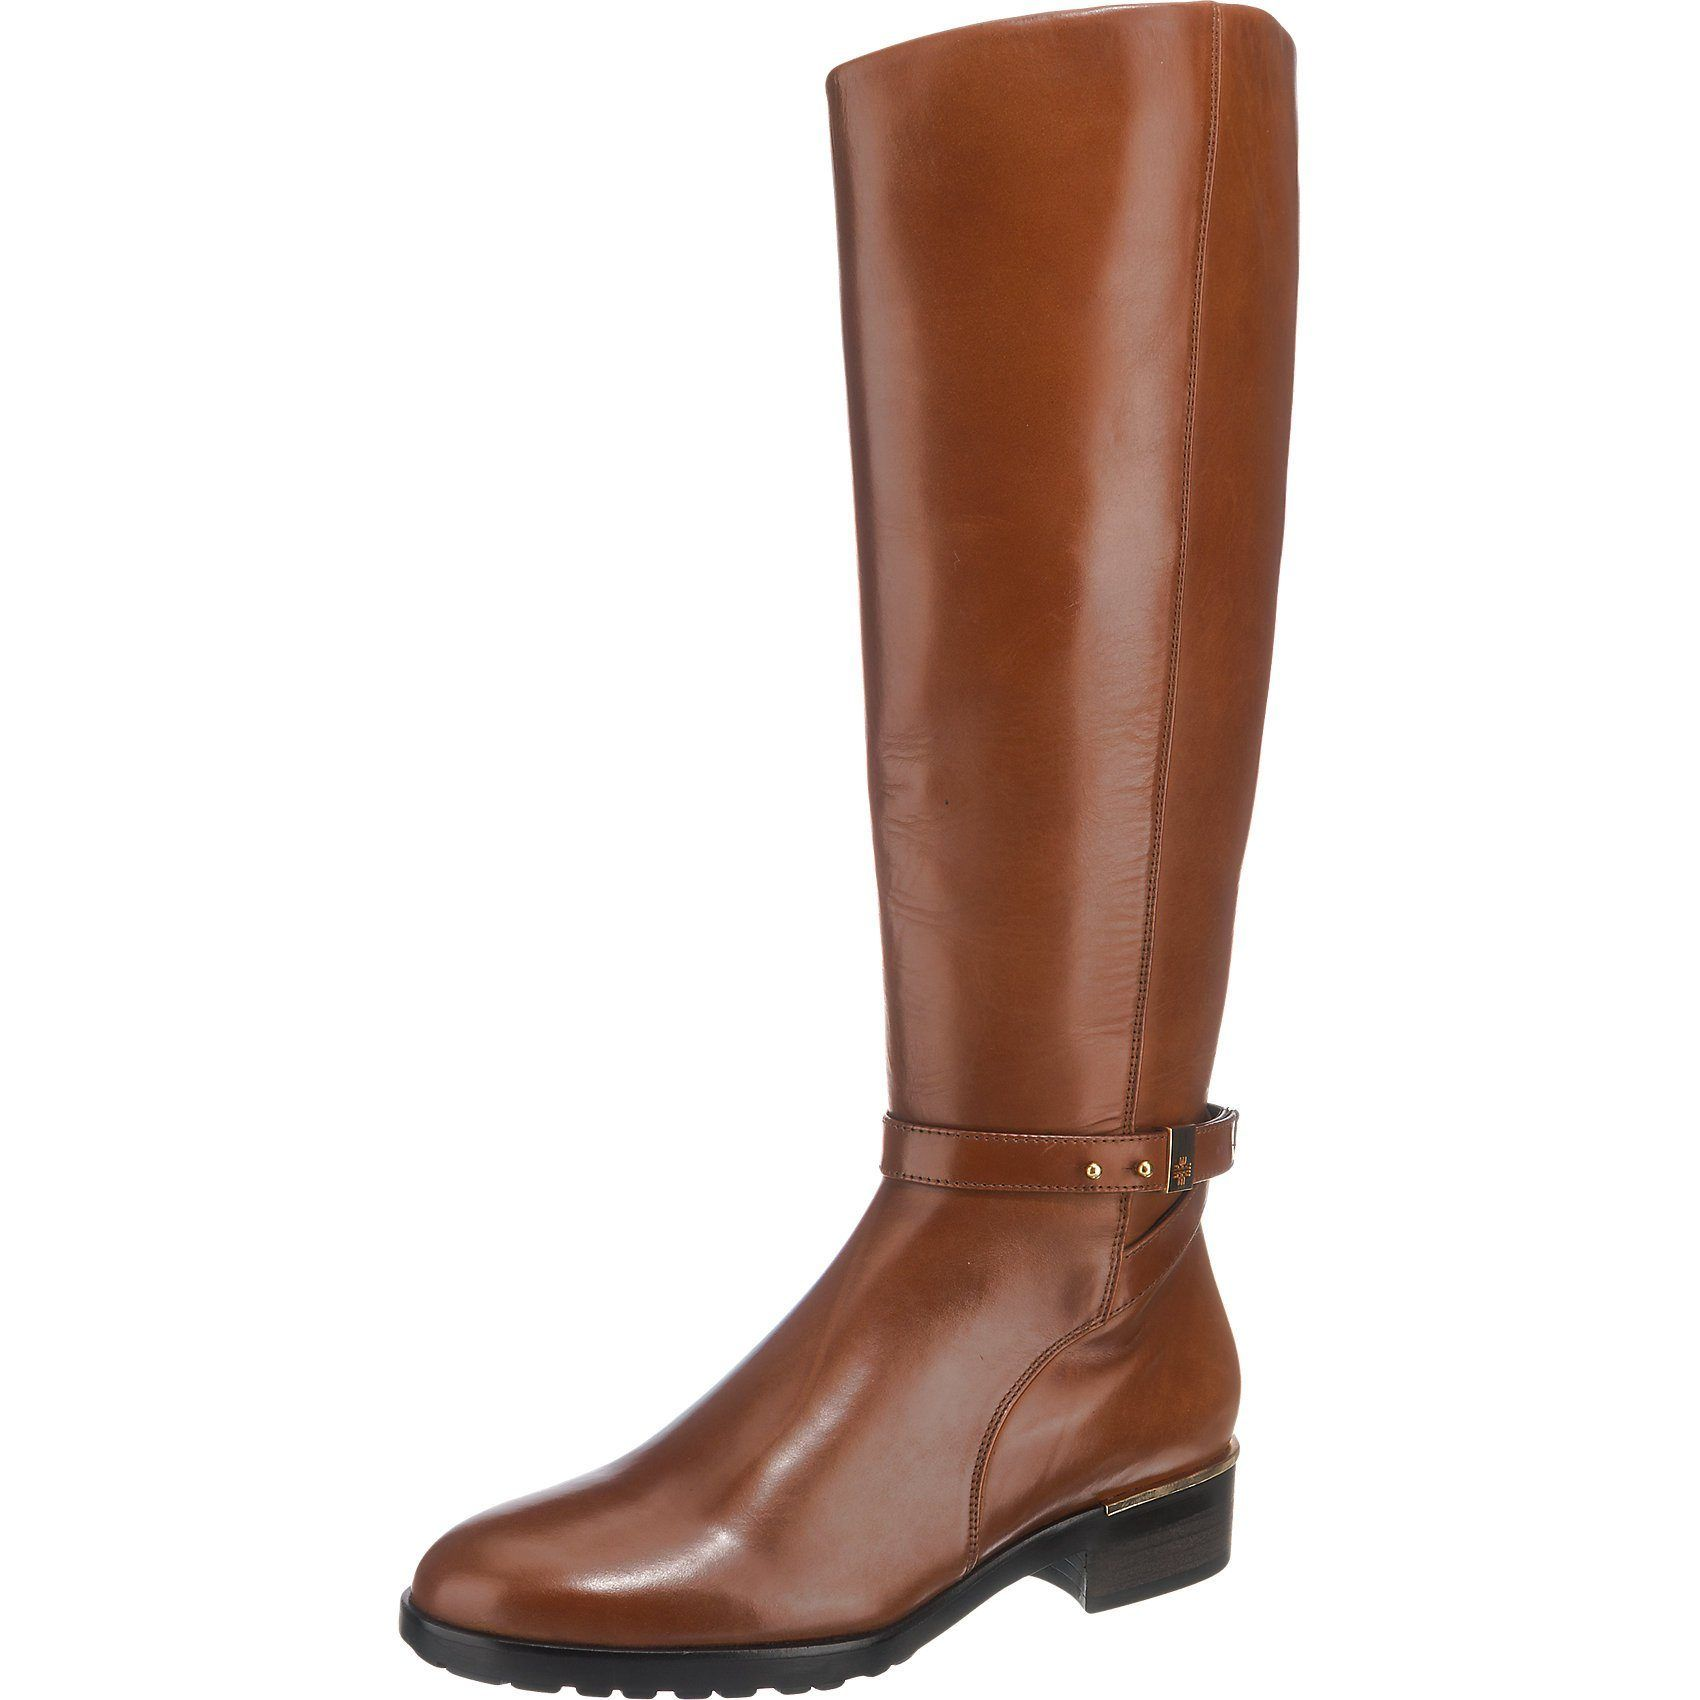 Damenstiefel#högl Stiefel#Maria Baum Fashion | Winterschuhe